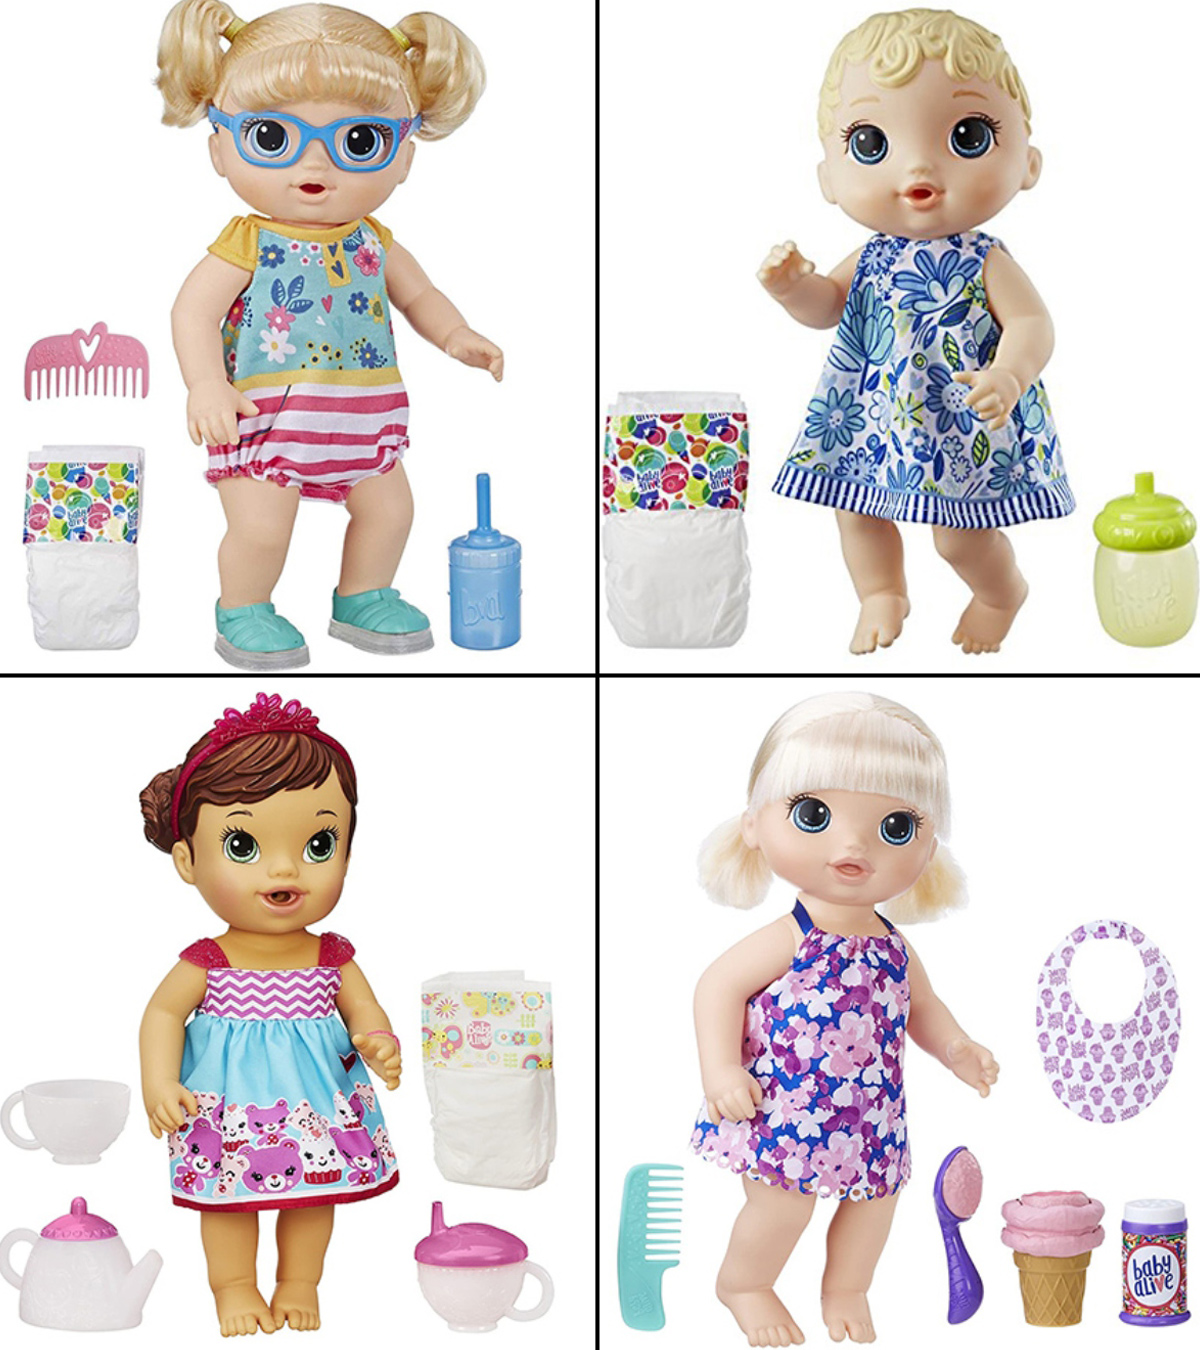 13 Best Baby Alive Dolls Of 2020